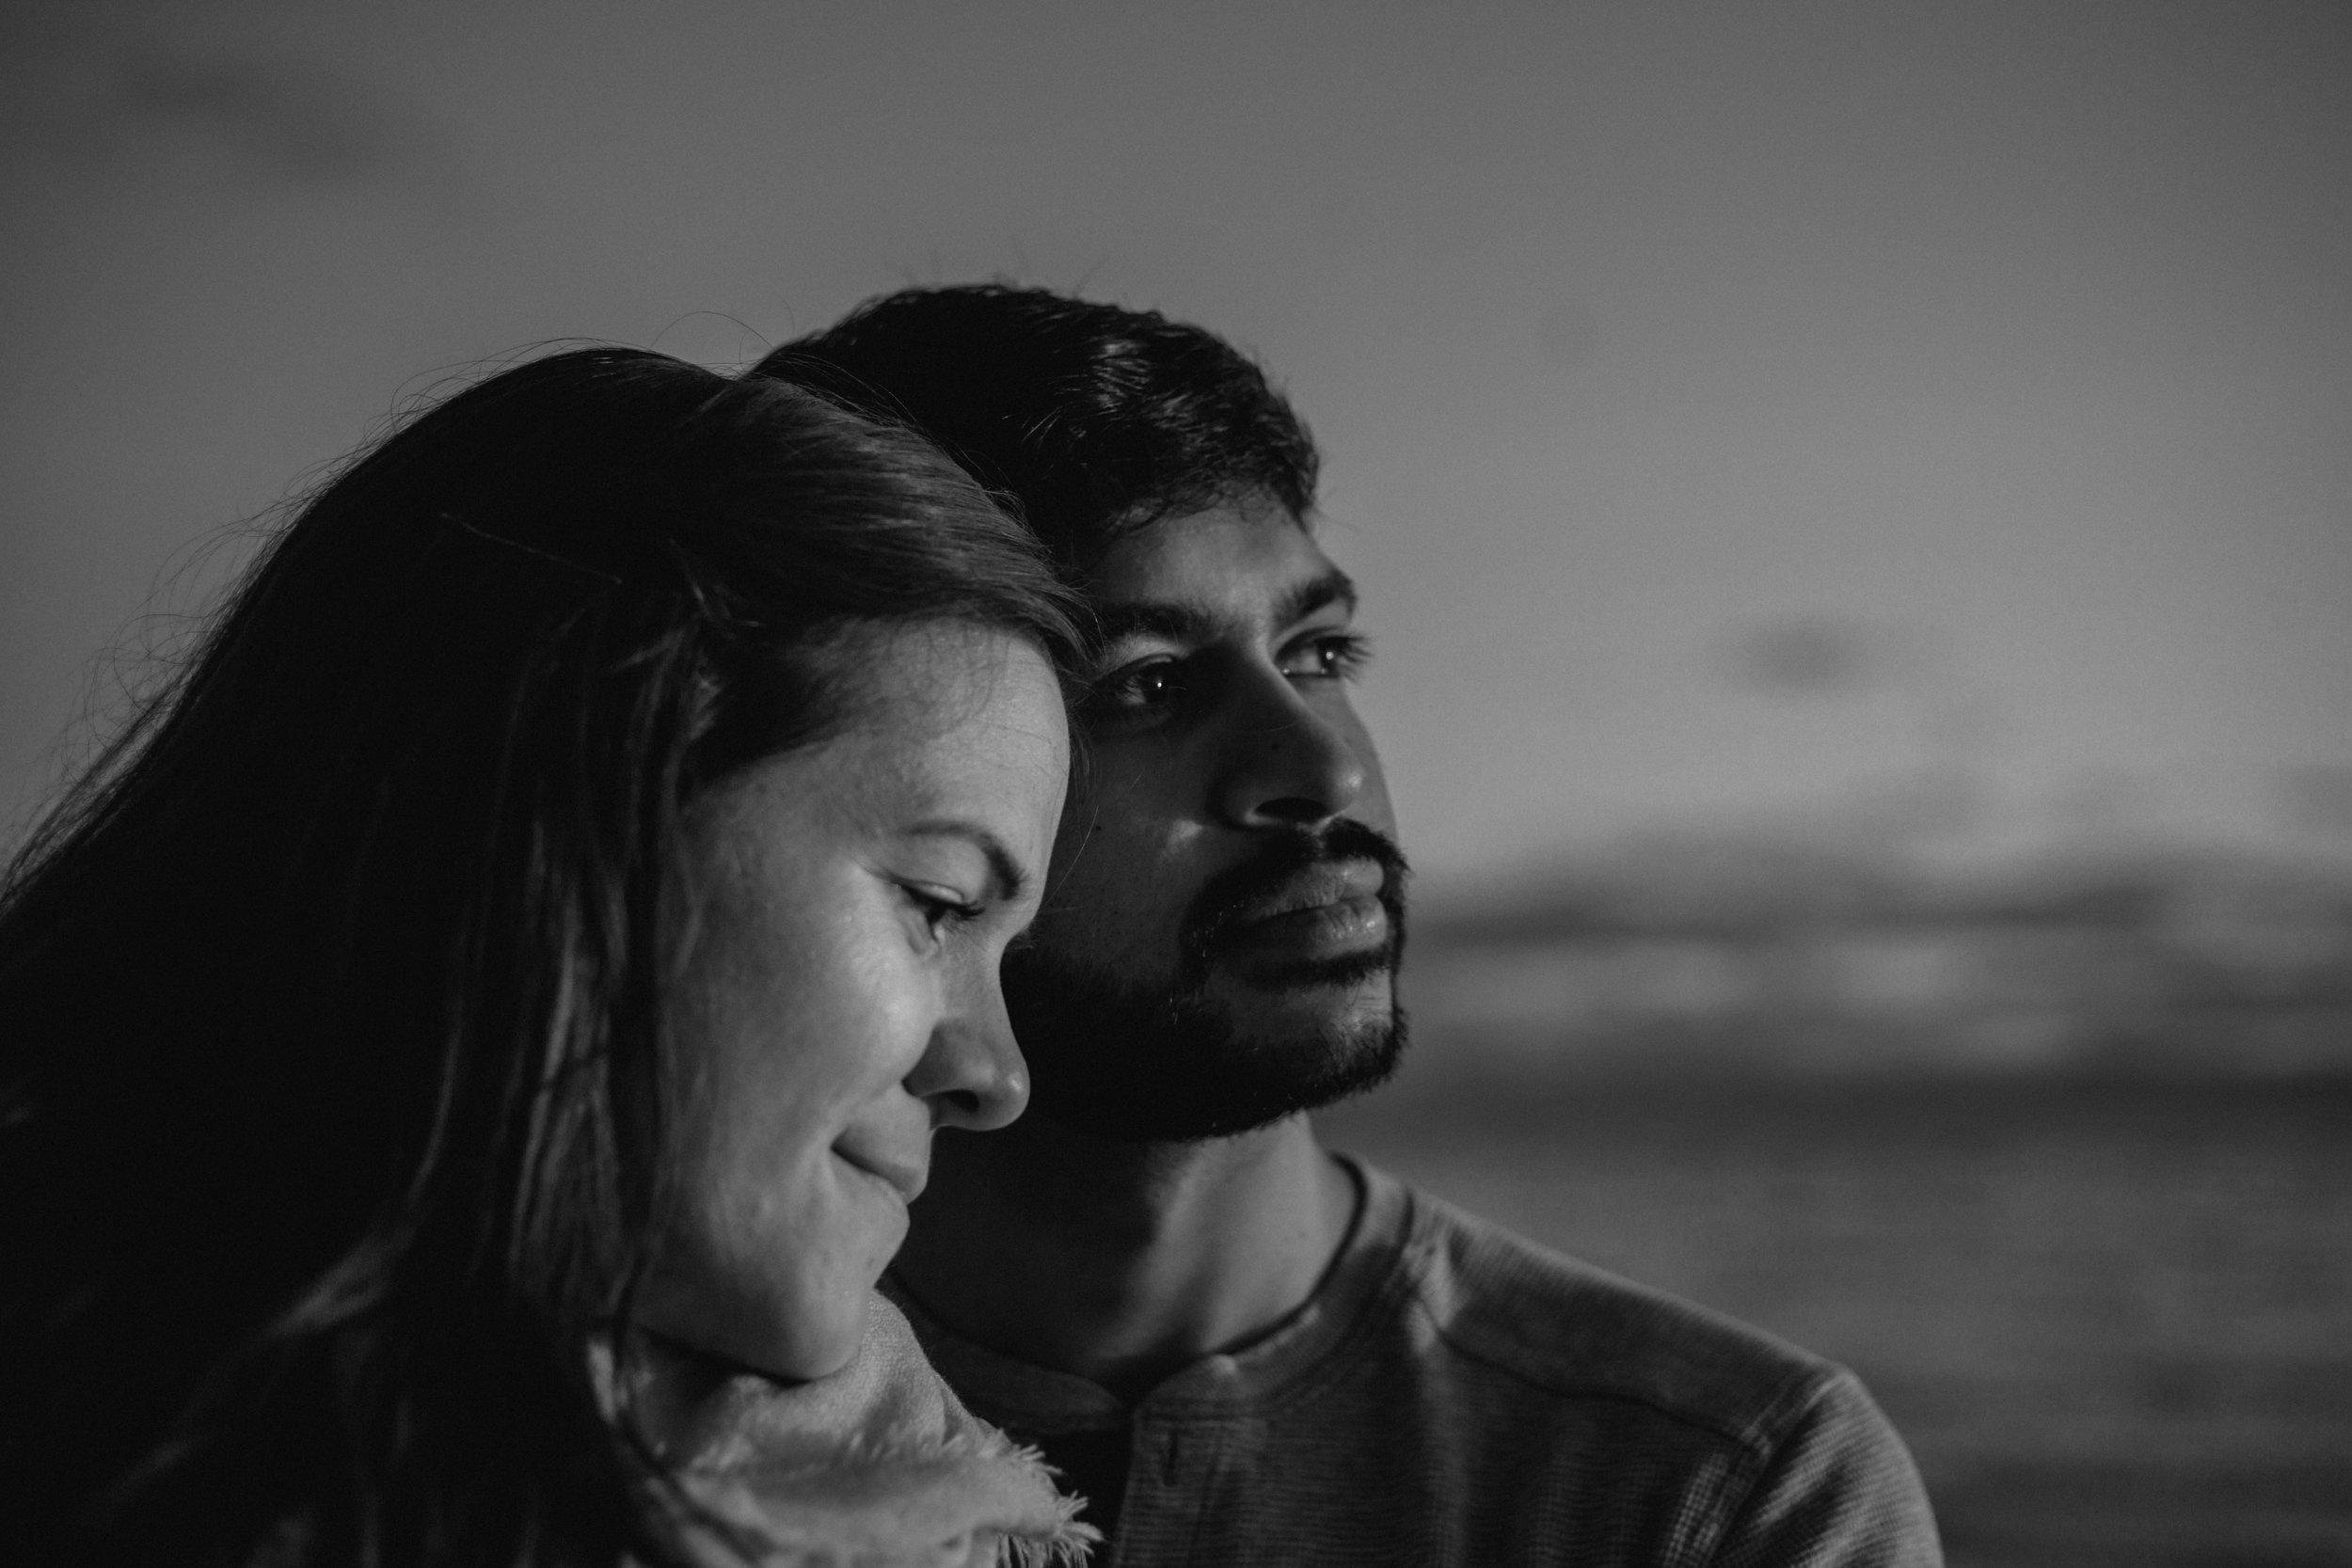 Black and White Sunshine Coast BC Engagement Photos on the Beach at Sunset